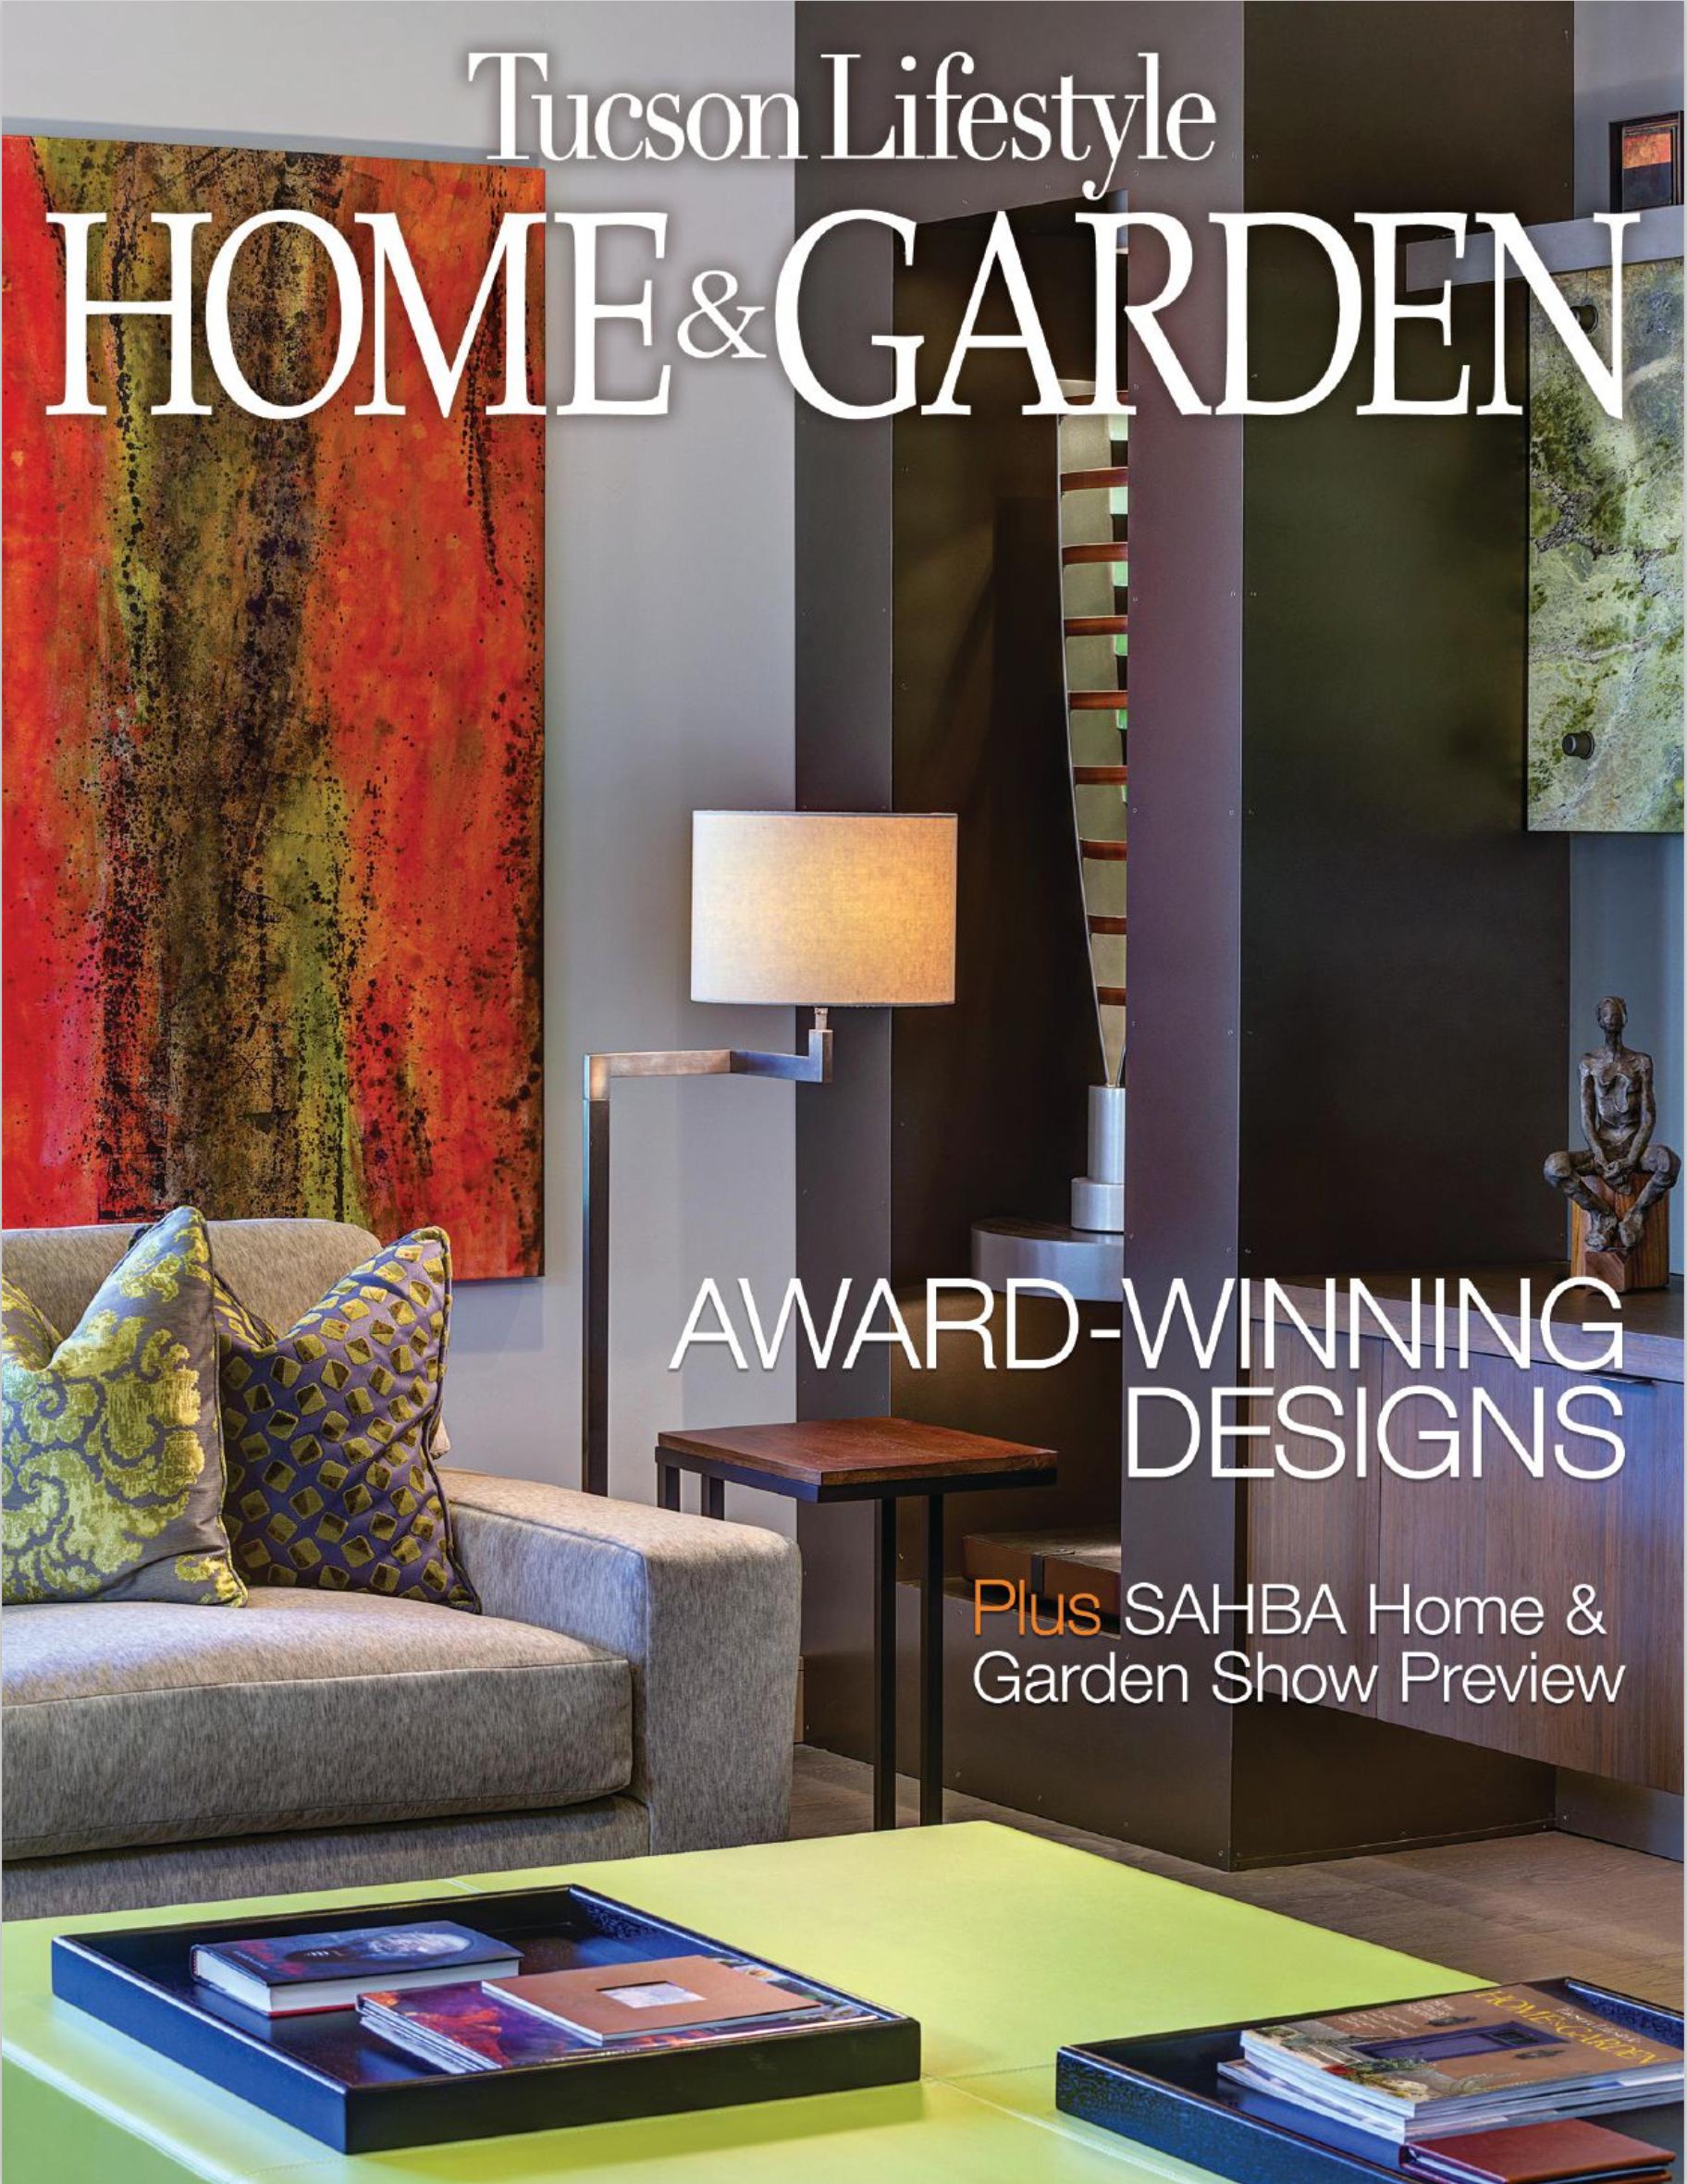 TUCSON LIFESTYLE HOME & GARDEN MAGAZINE Oct. 2015